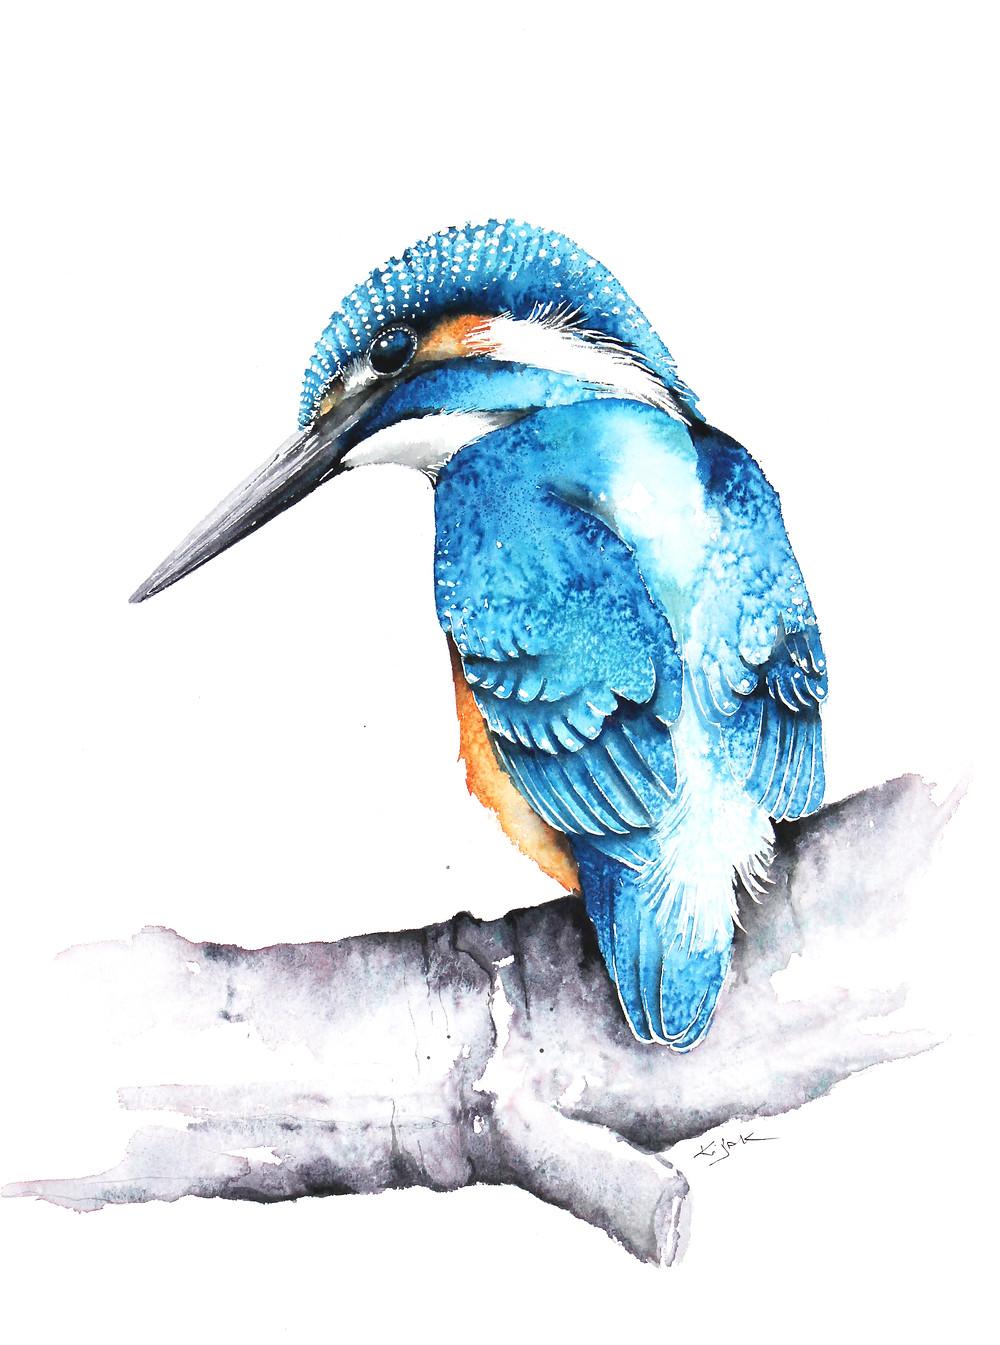 Kingfisher illustrations